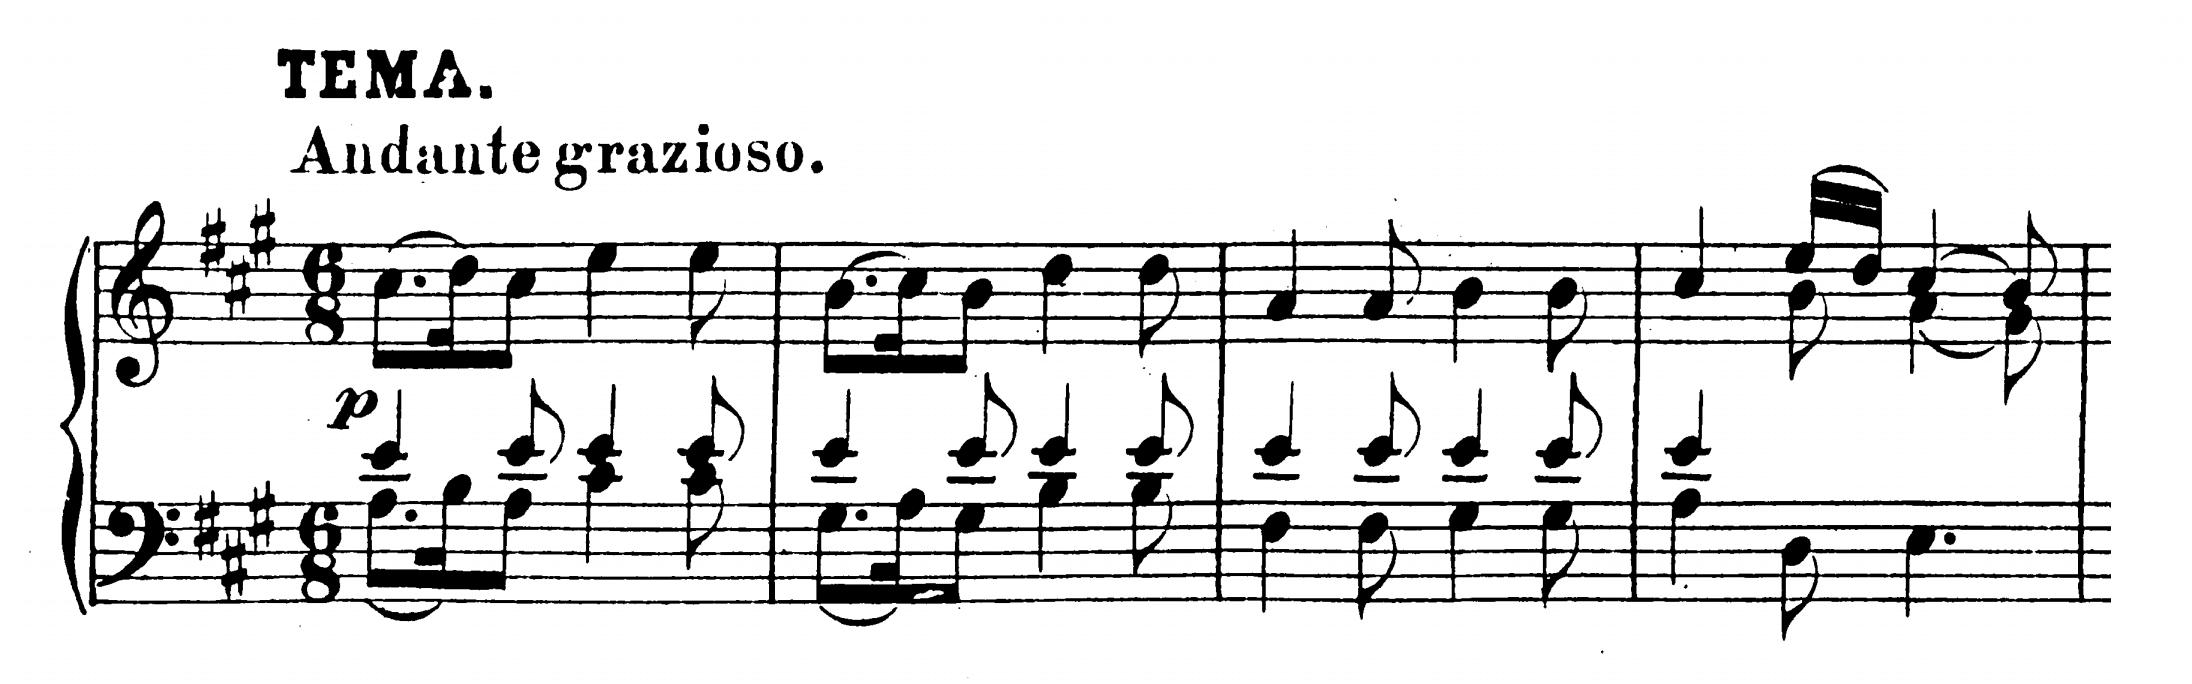 Alla Turca Mozart mozart: piano sonata no.11 in a major, k.331 analysis